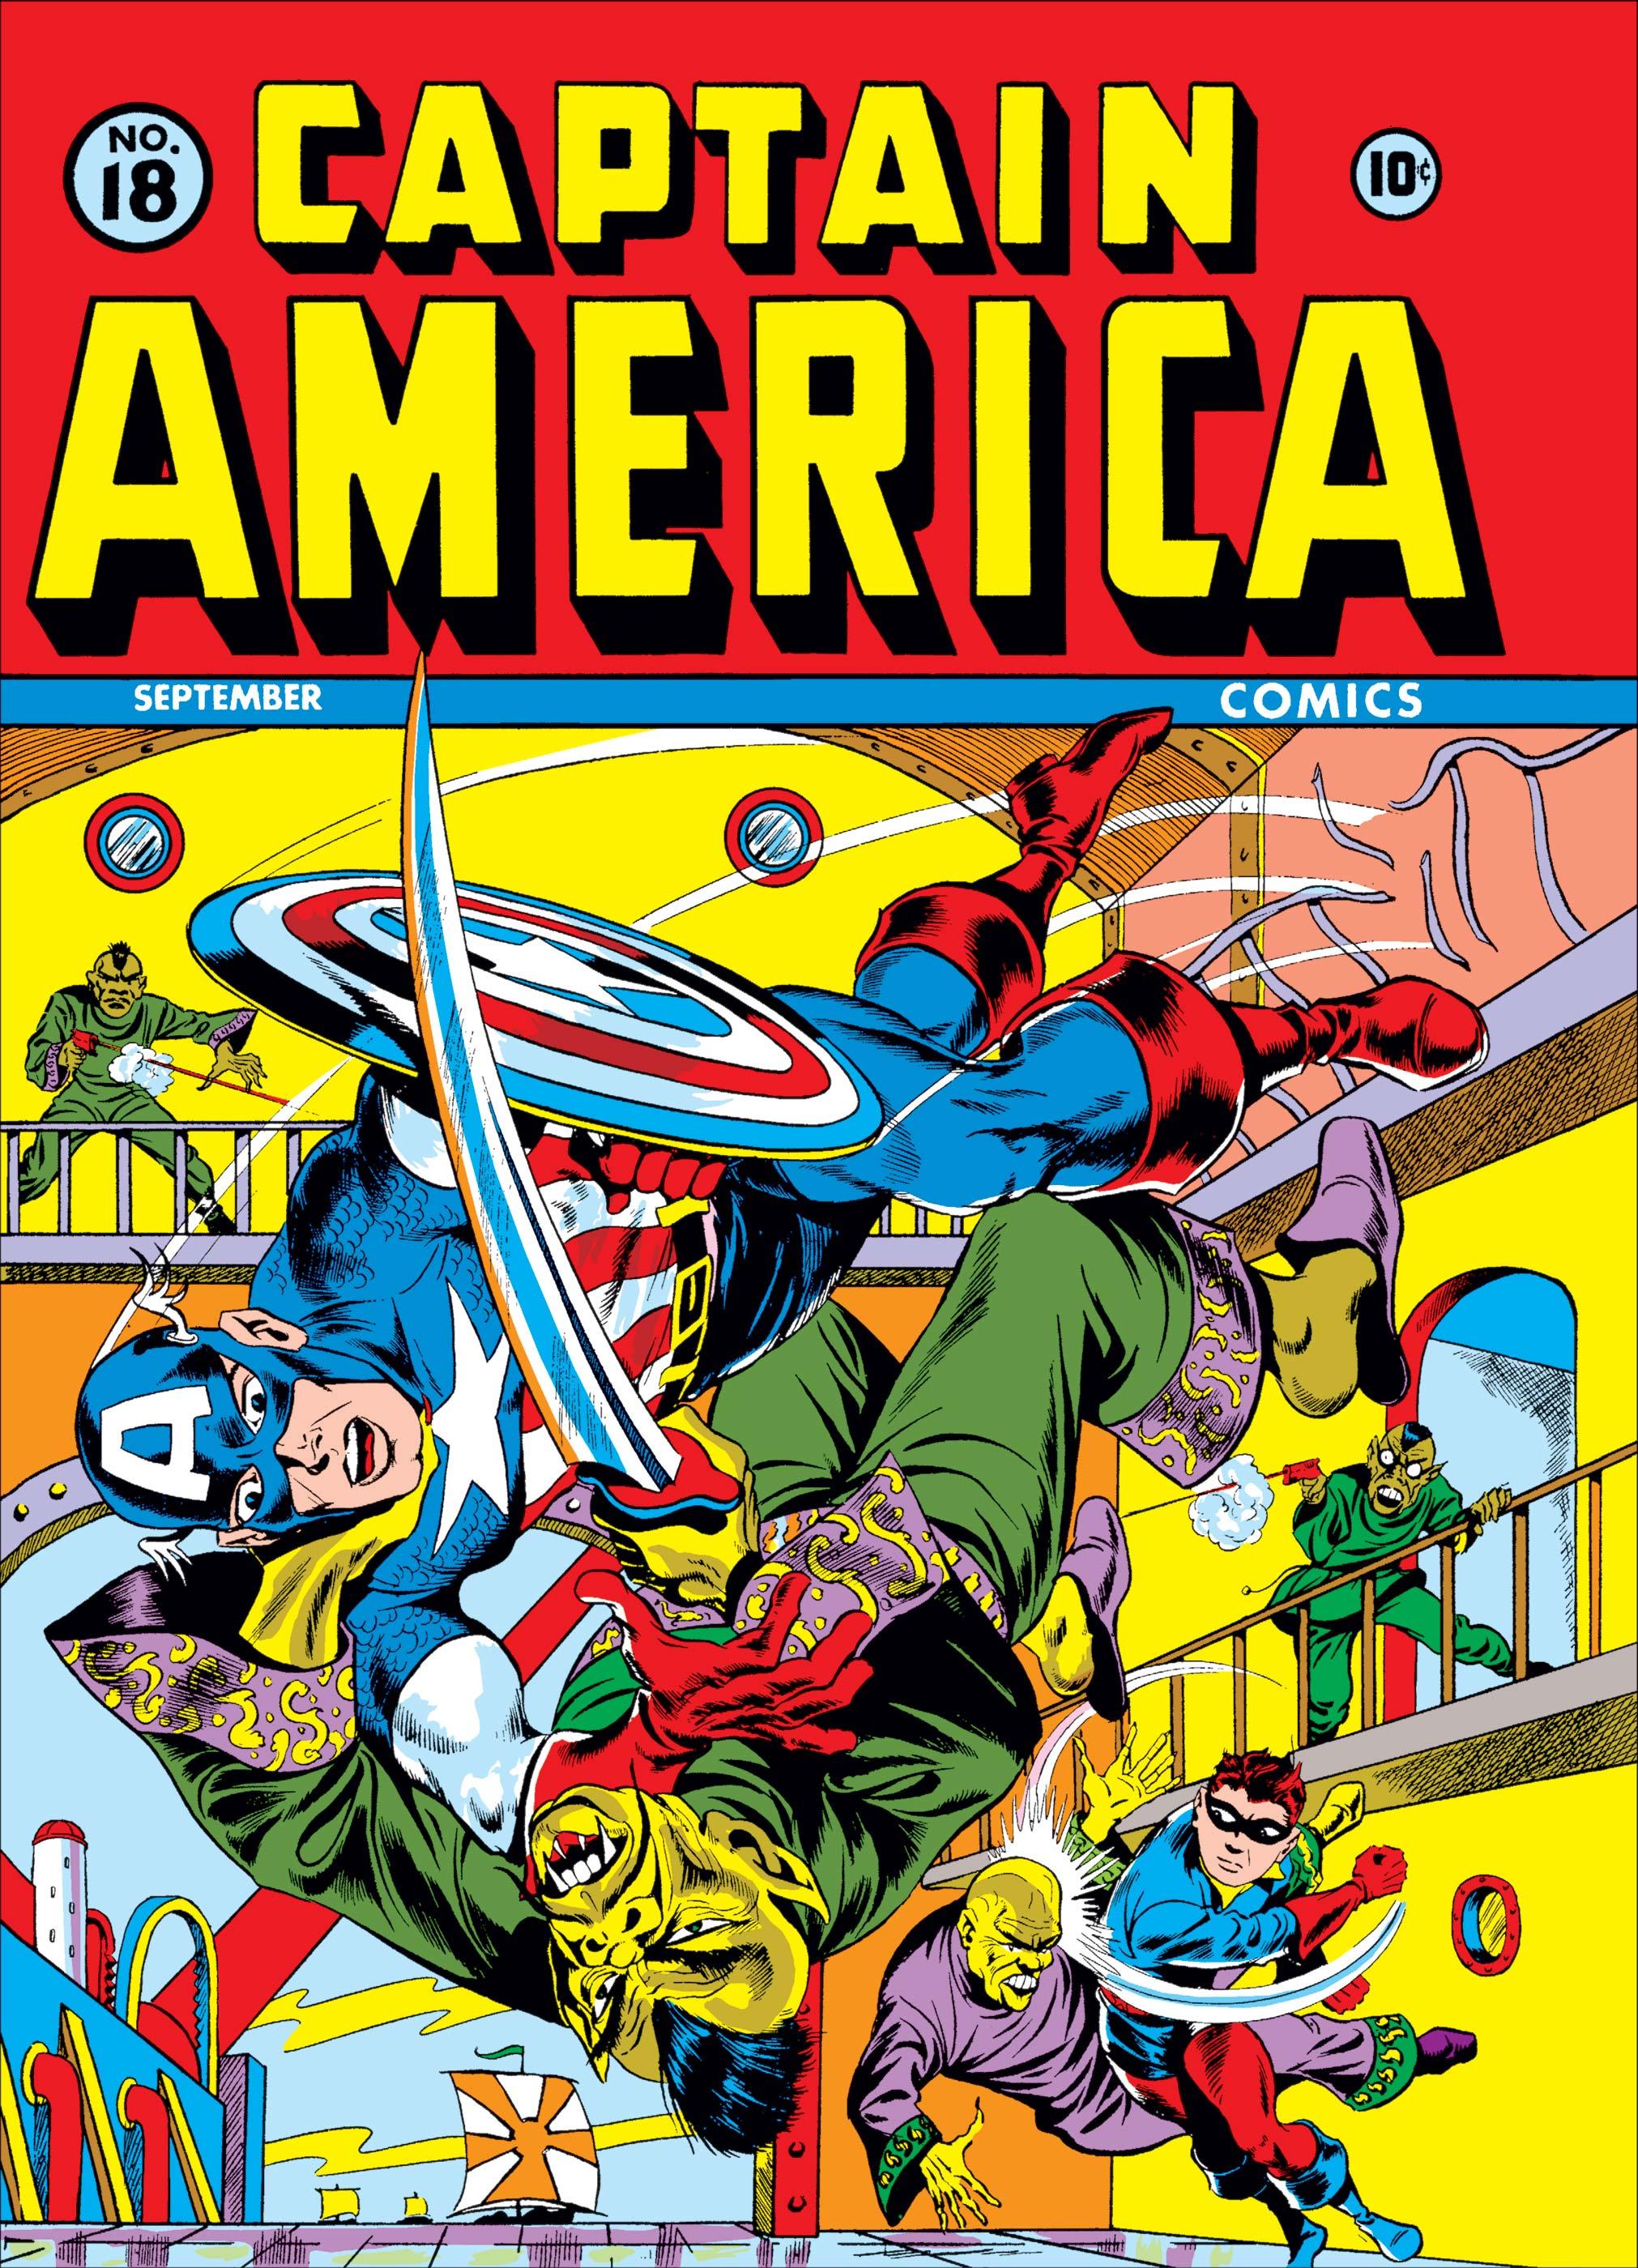 Captain America Comics (1941) #18